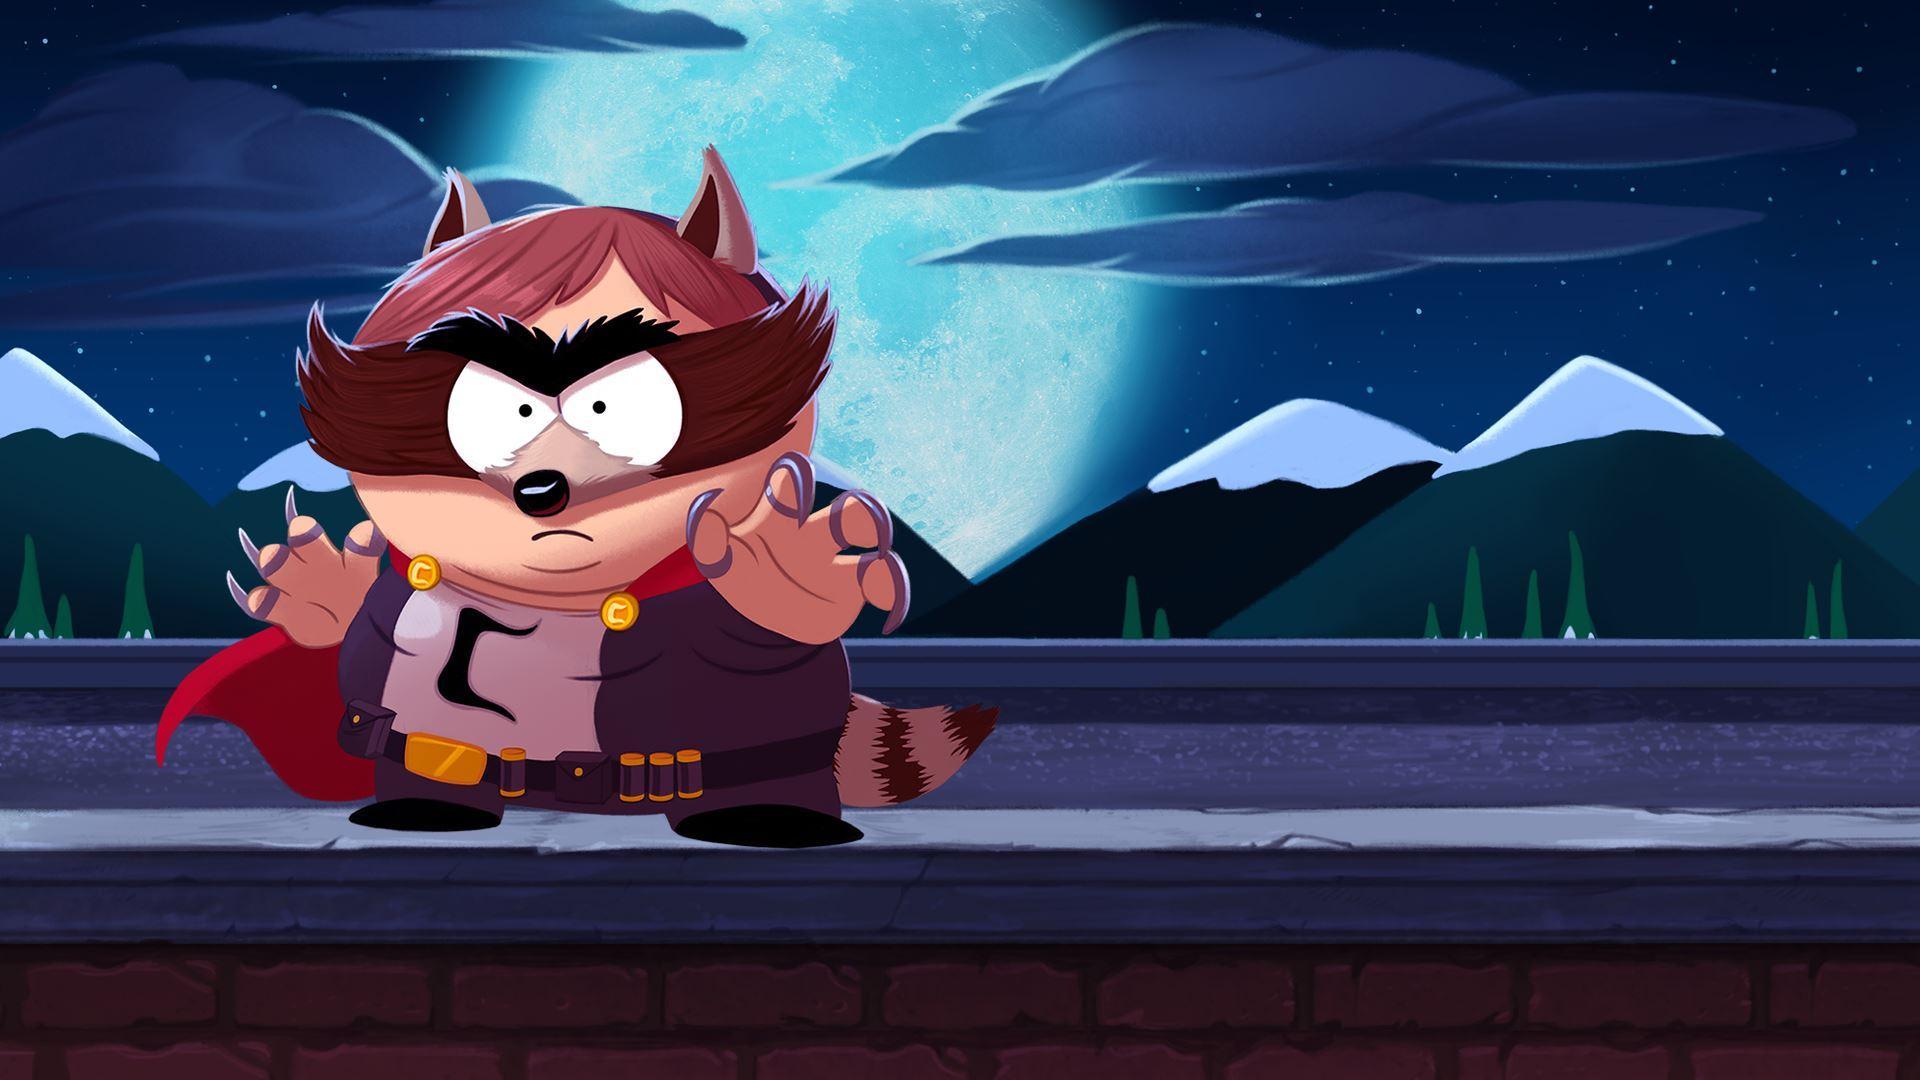 Очередная победа хакеров, на этот раз South Park: The Fractured But Whole